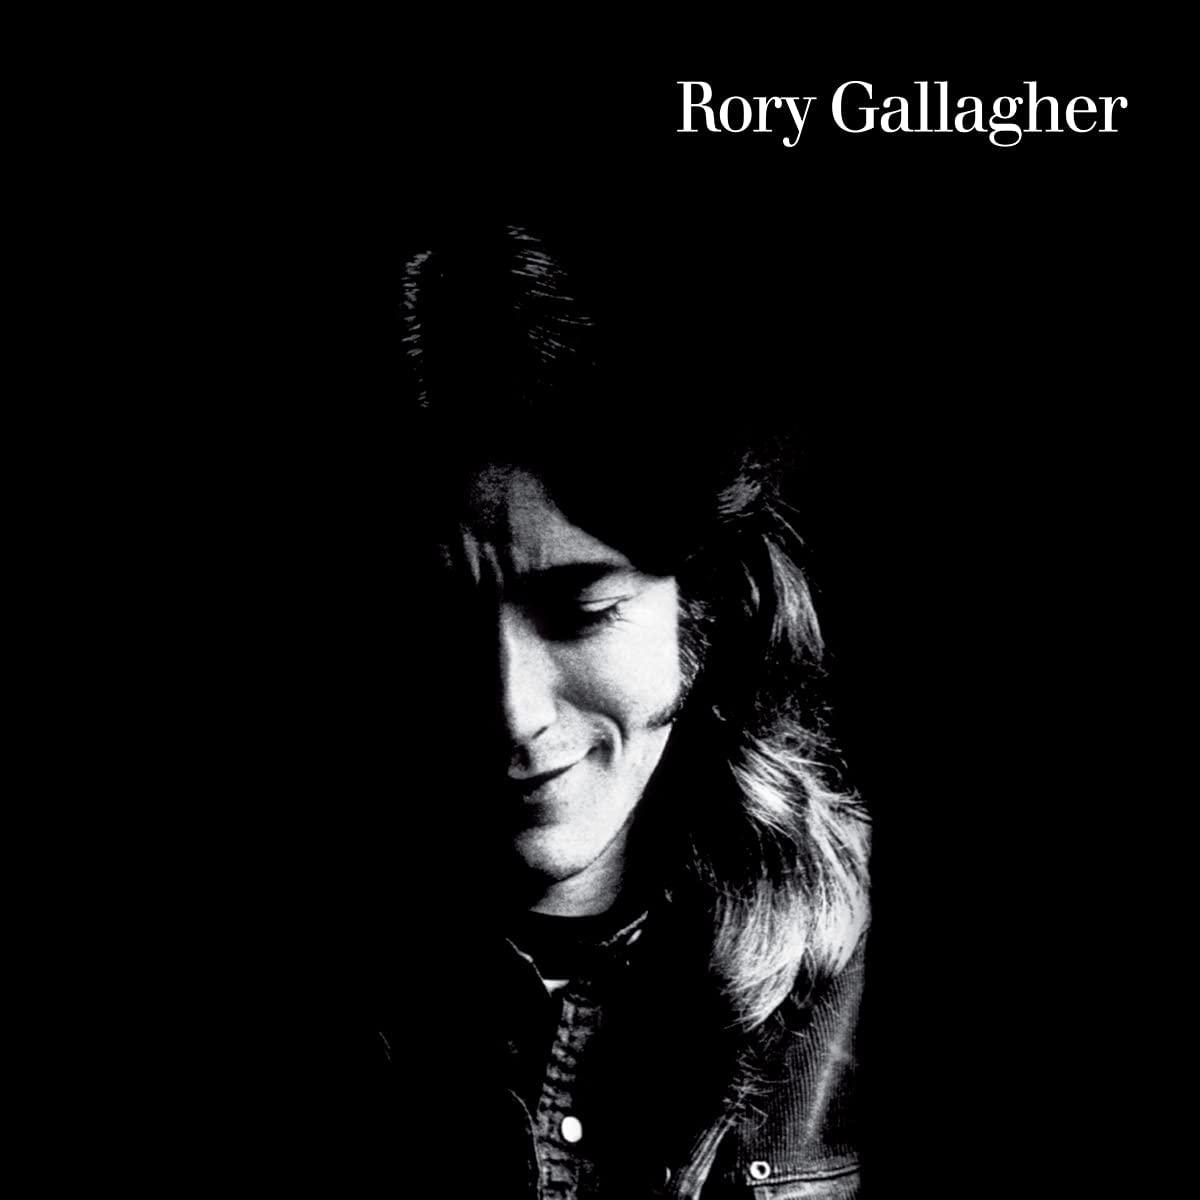 Rory Gallagher 50th anniversary 3LP vinyl